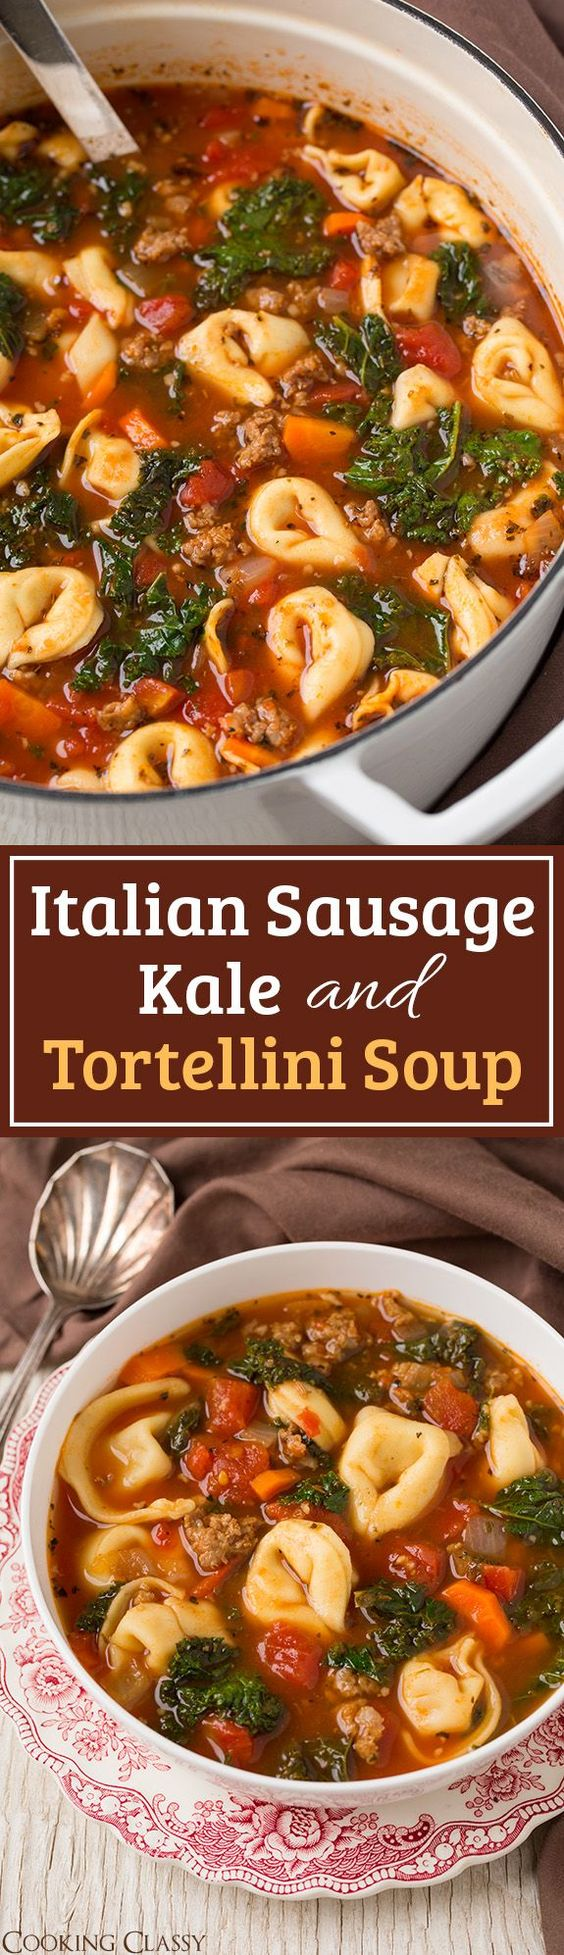 sausages tortellini soup tortellini sausages kale italian soups ...